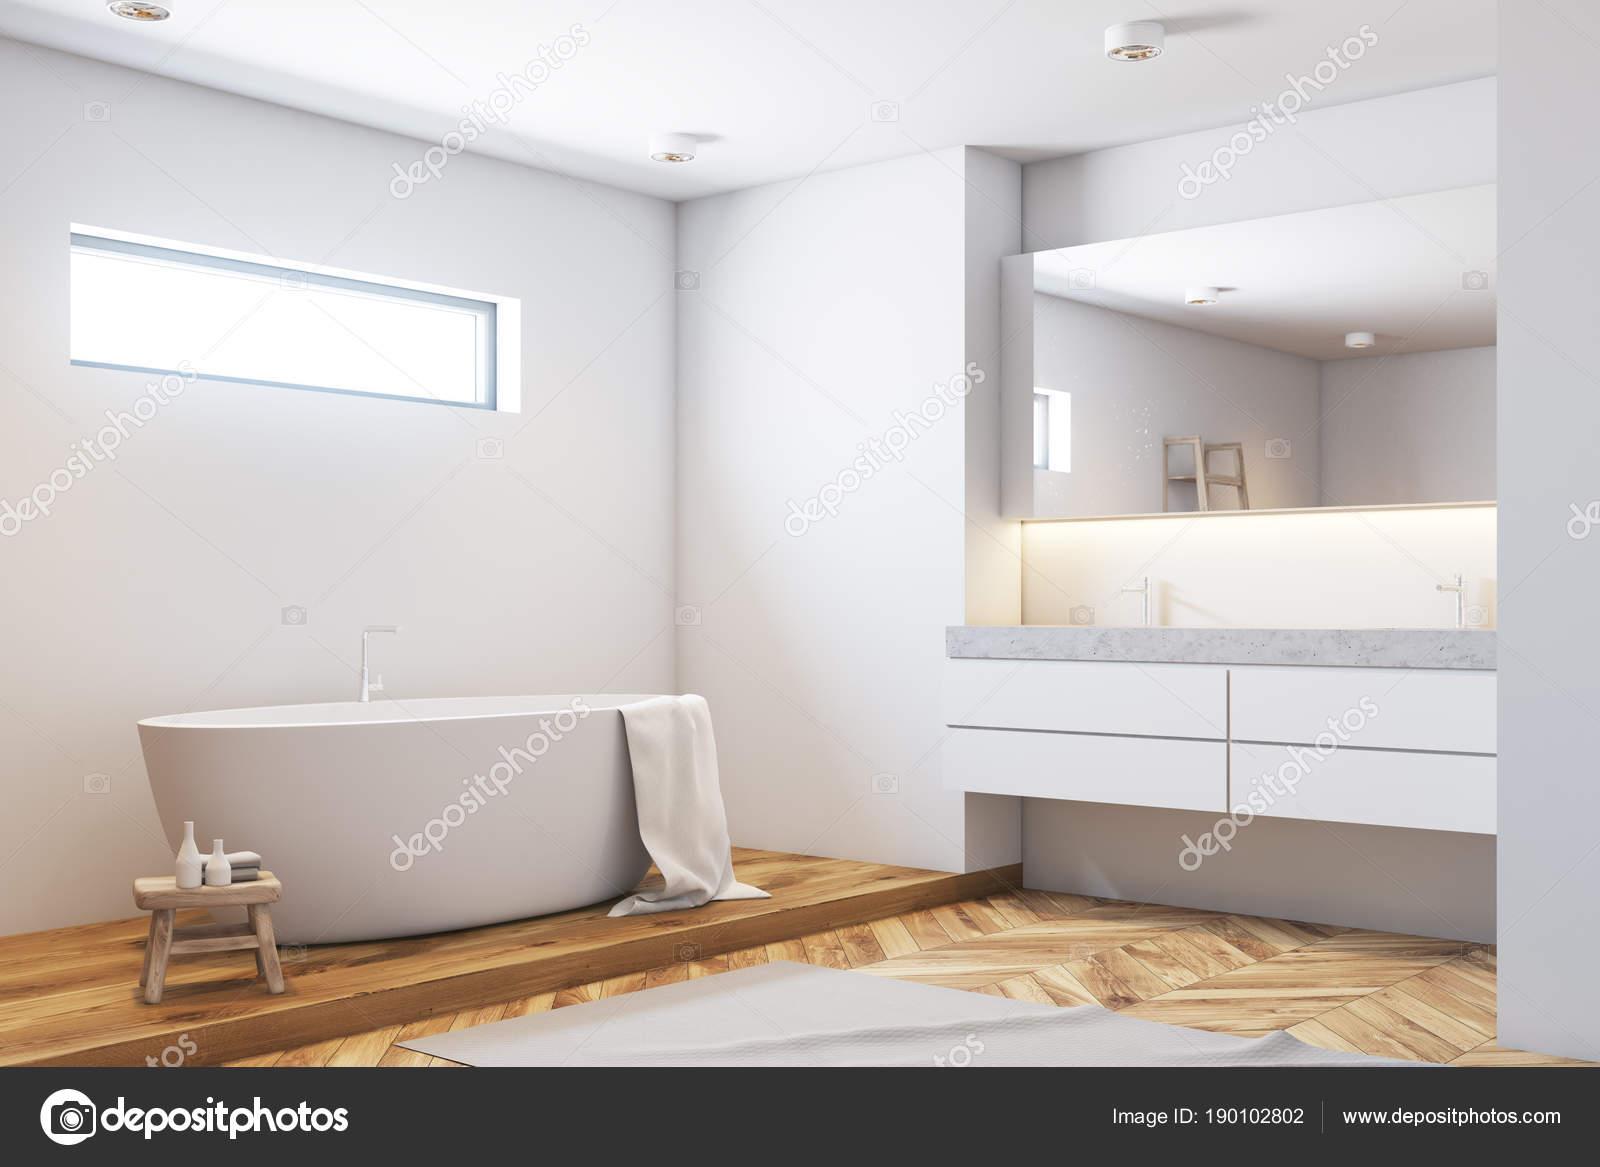 Salle De Bain Bois Blanc ~ baignoire d angle blanc blanc salle de bain bois photographie